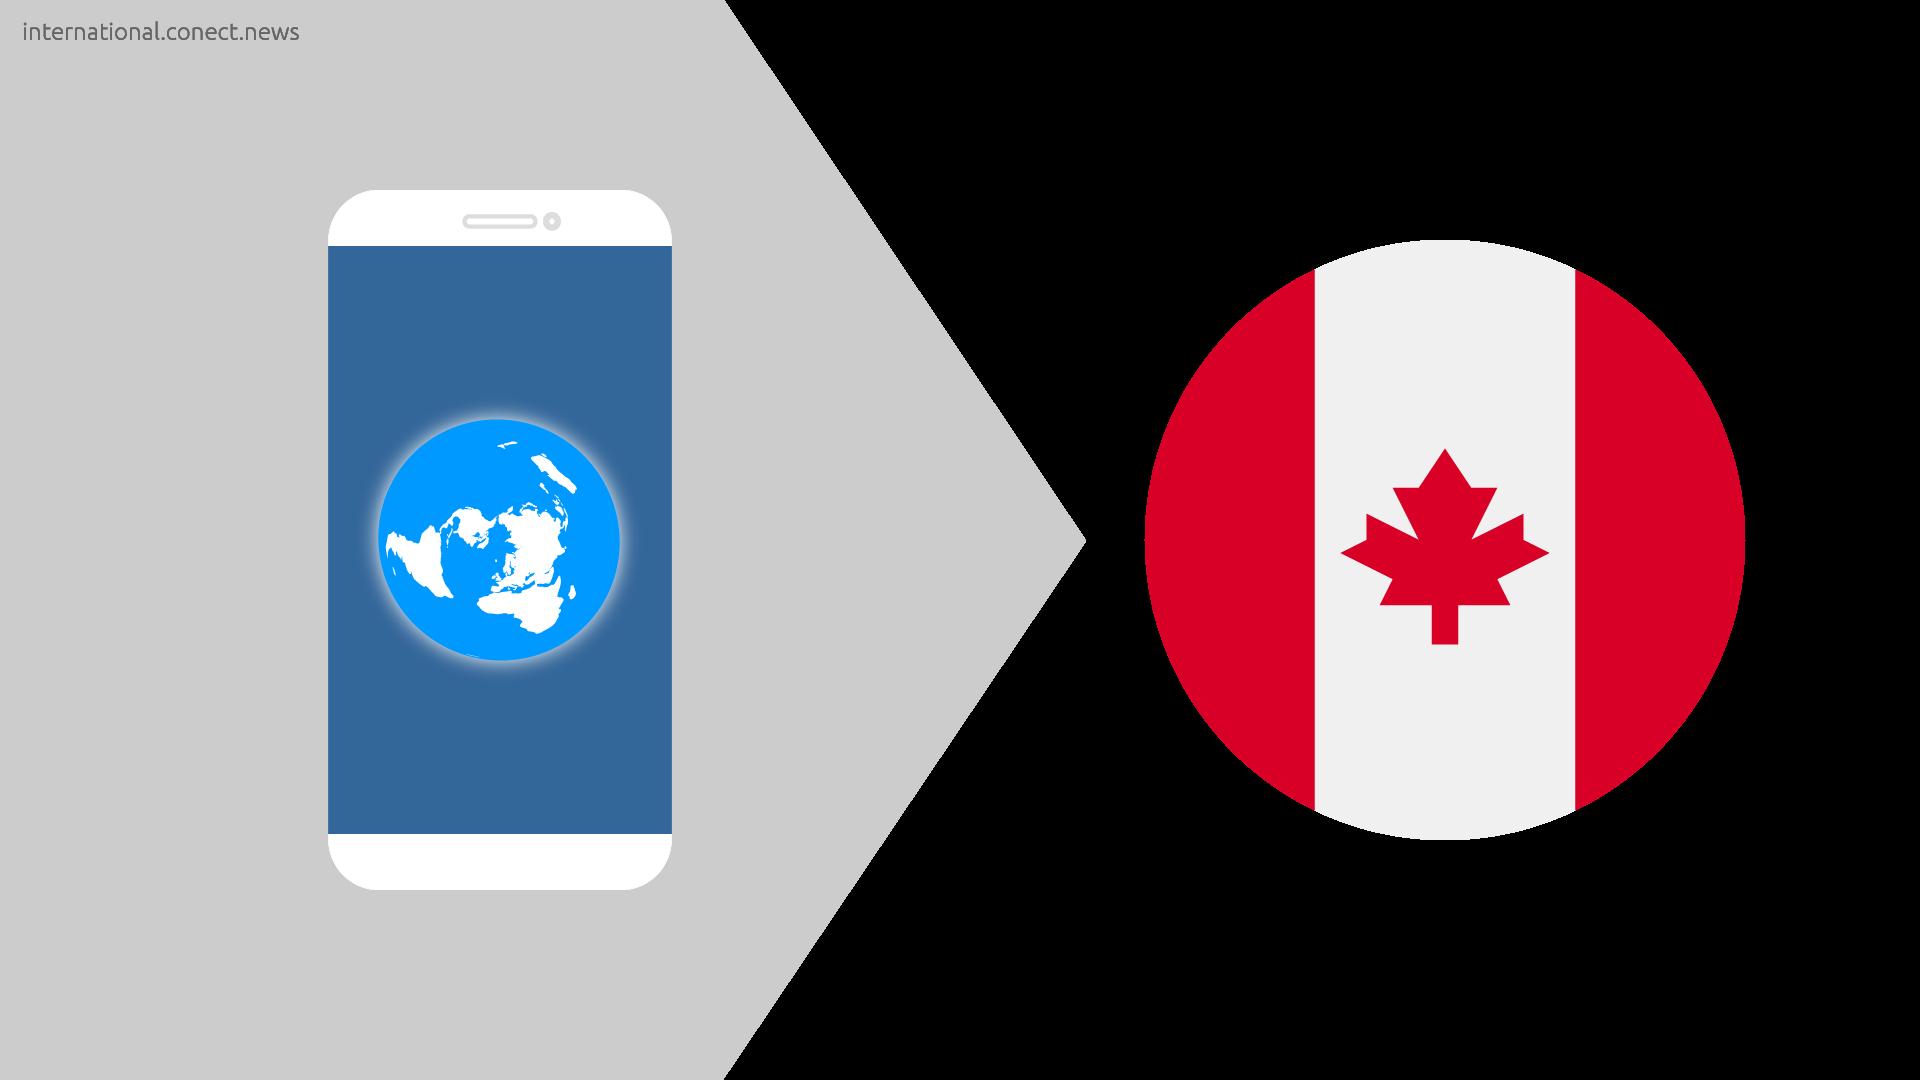 China-Canada @conect_news